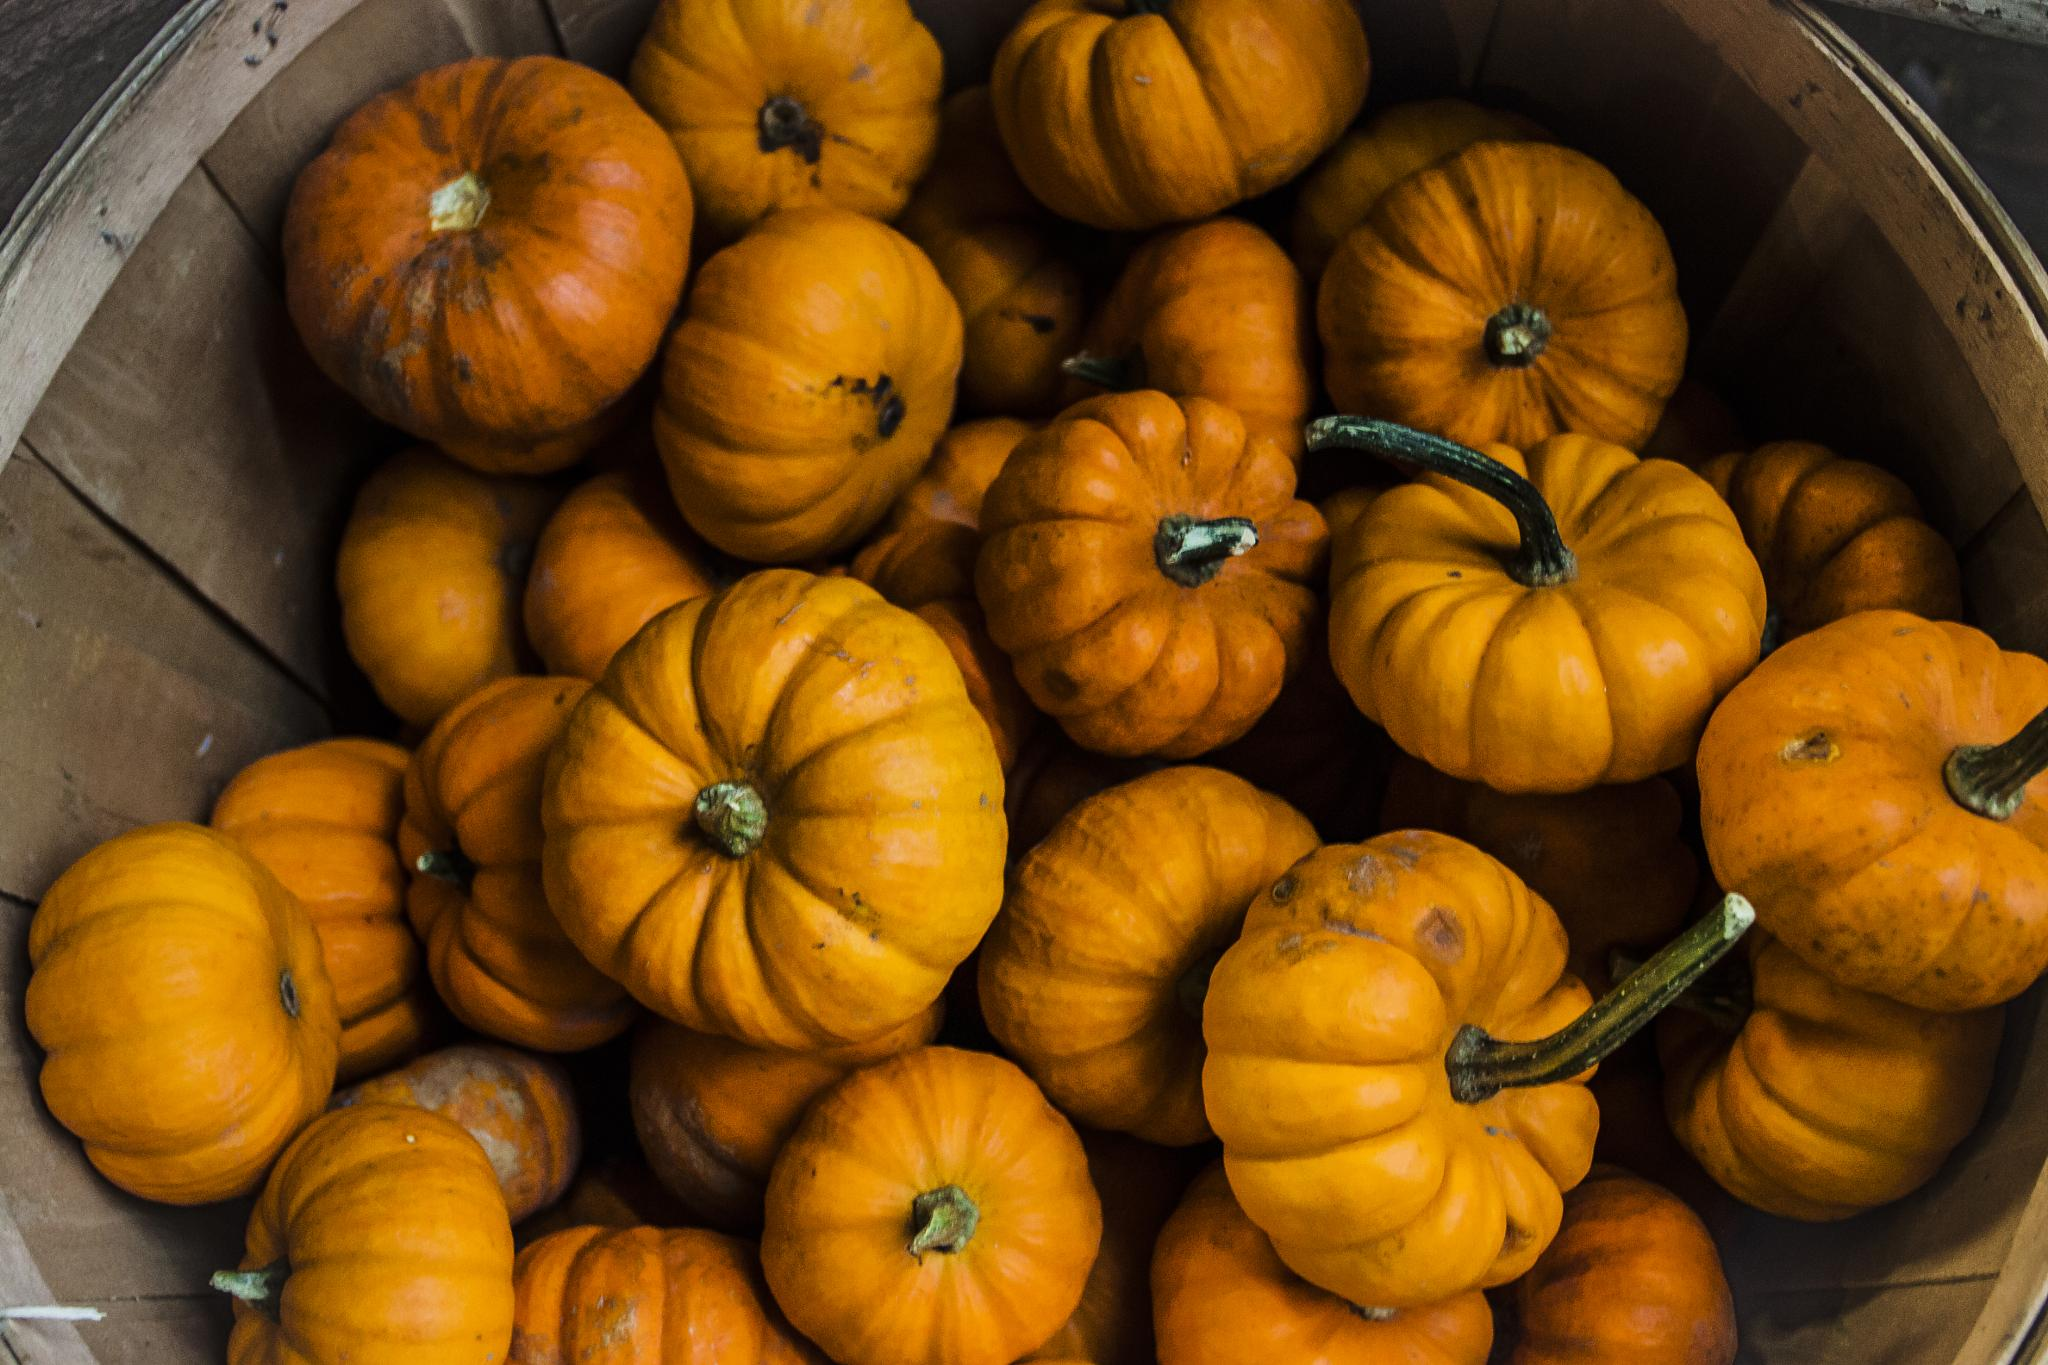 Gourds 3 - the pumpkins by Patrick Bogan